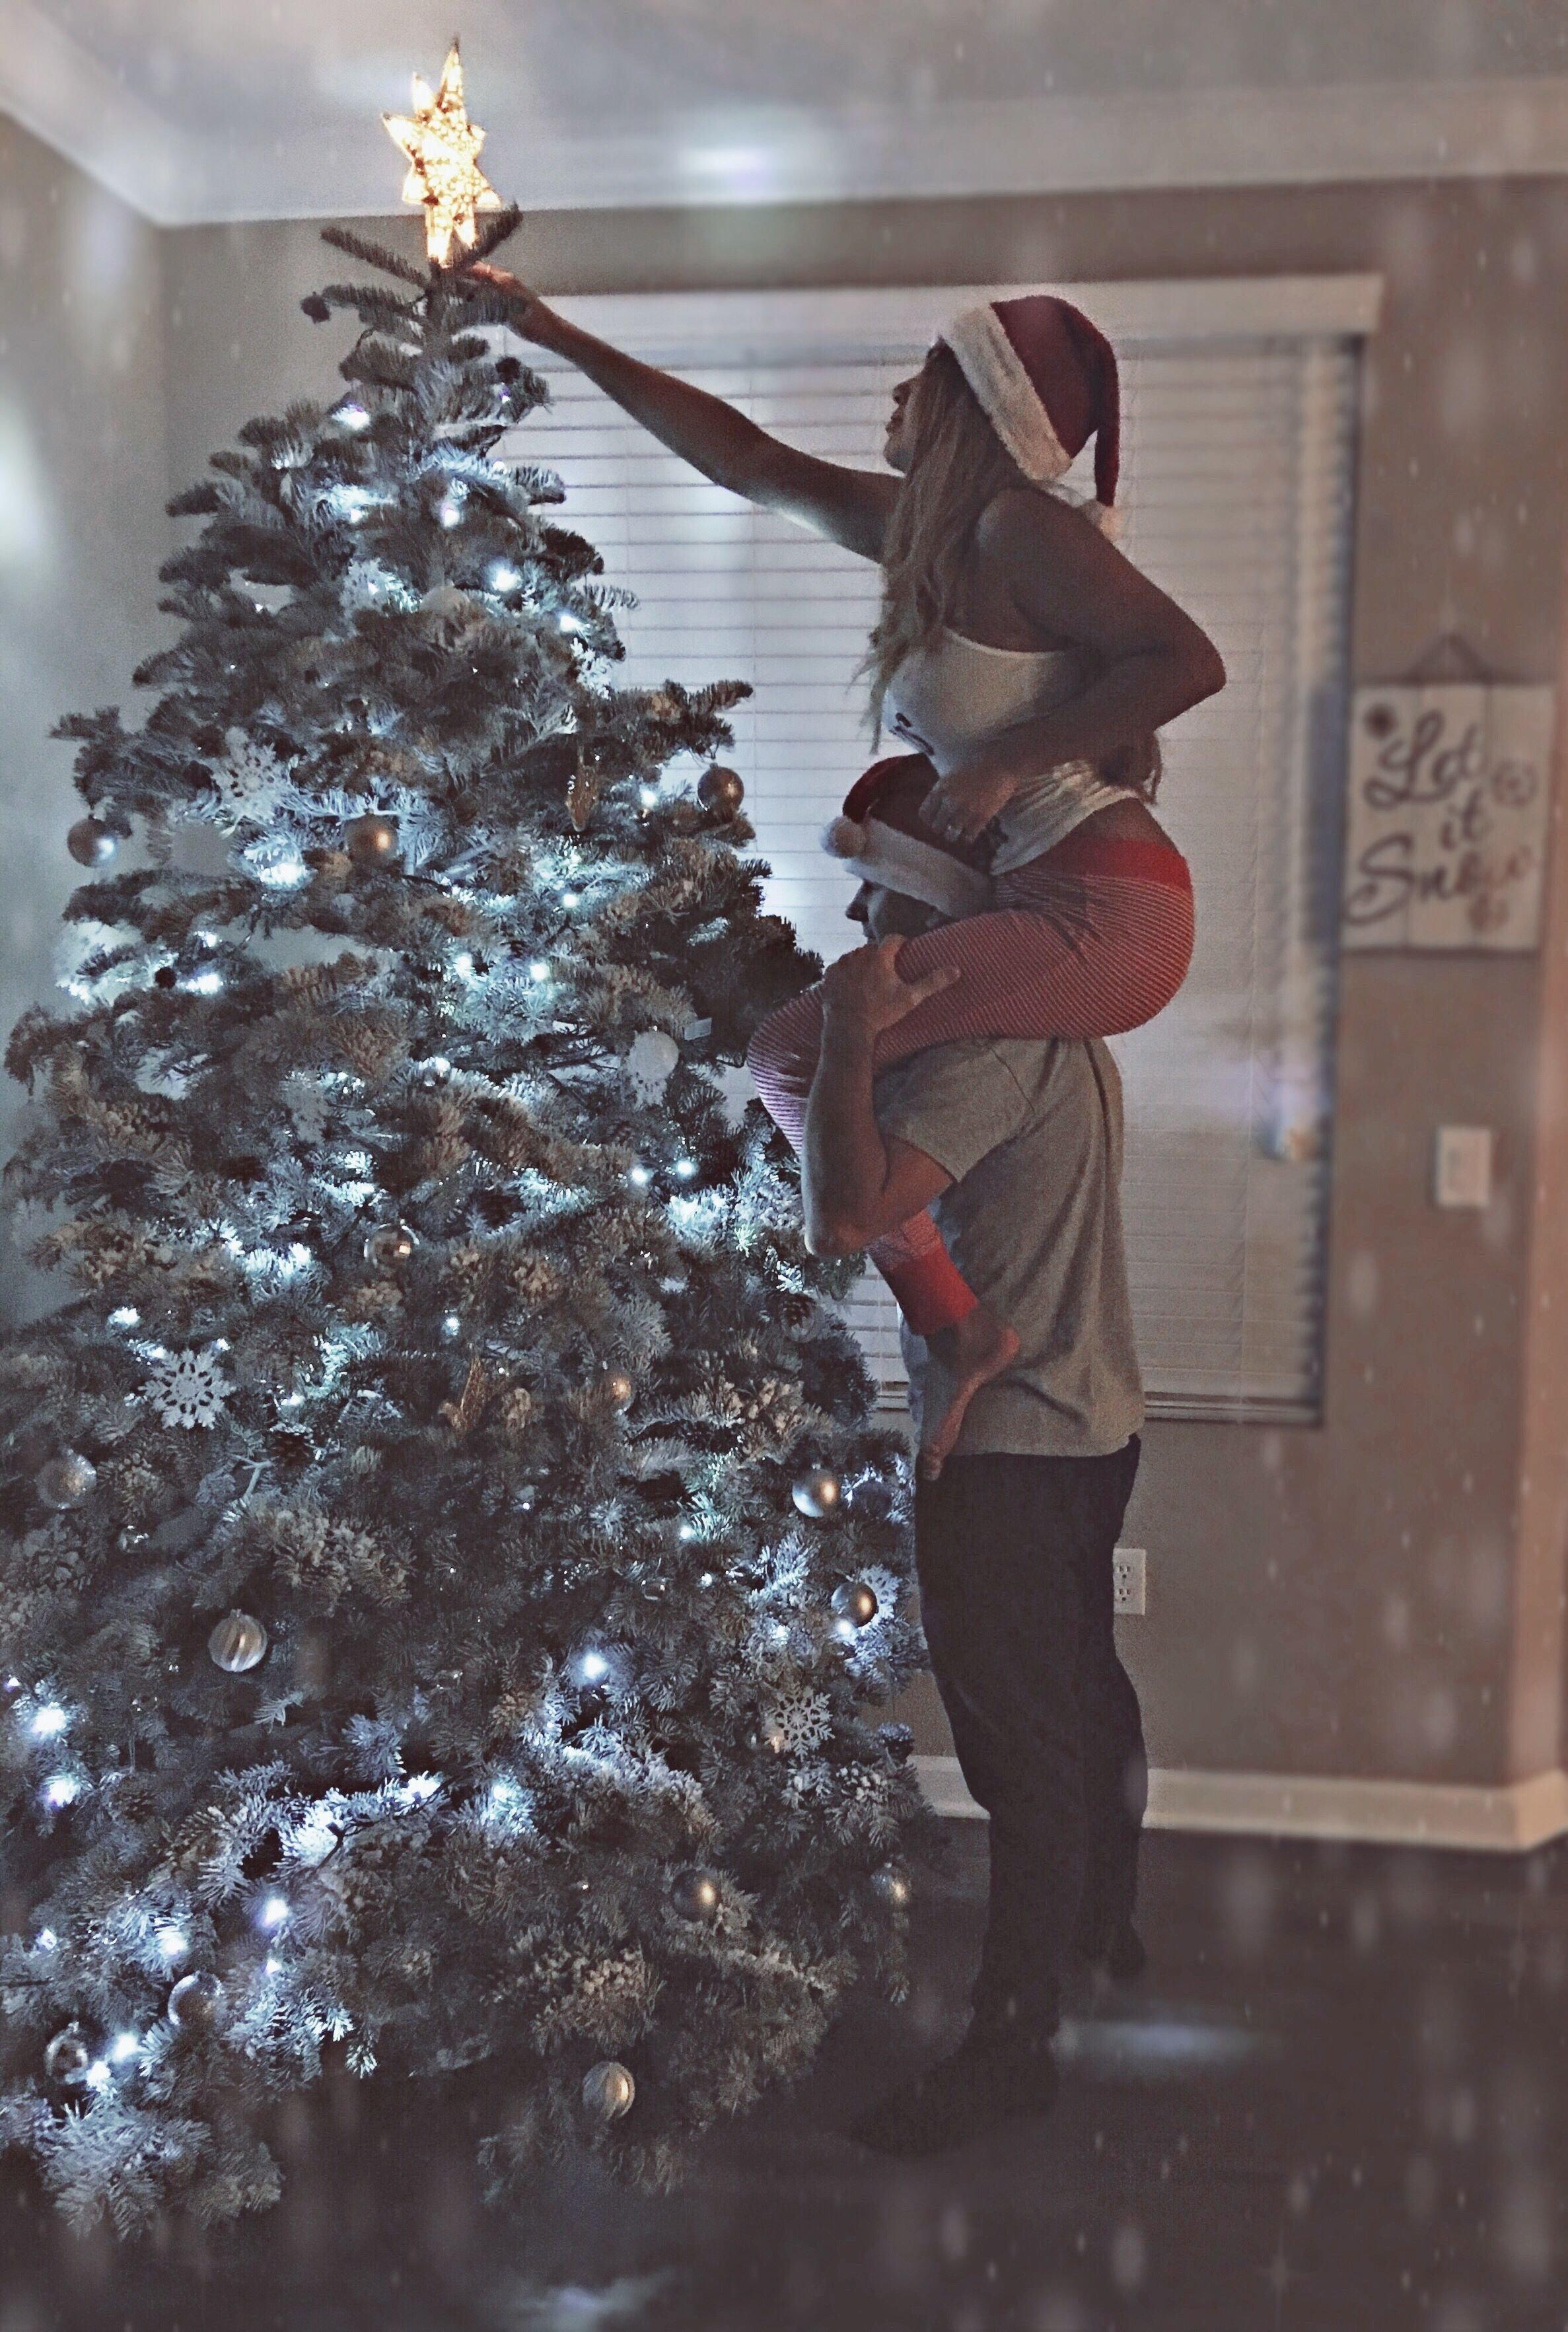 10 Fabulous Christmas Picture Ideas For Couples selenakulikovskiy danikkulikovskiy instagram couple goals photo 1 2020